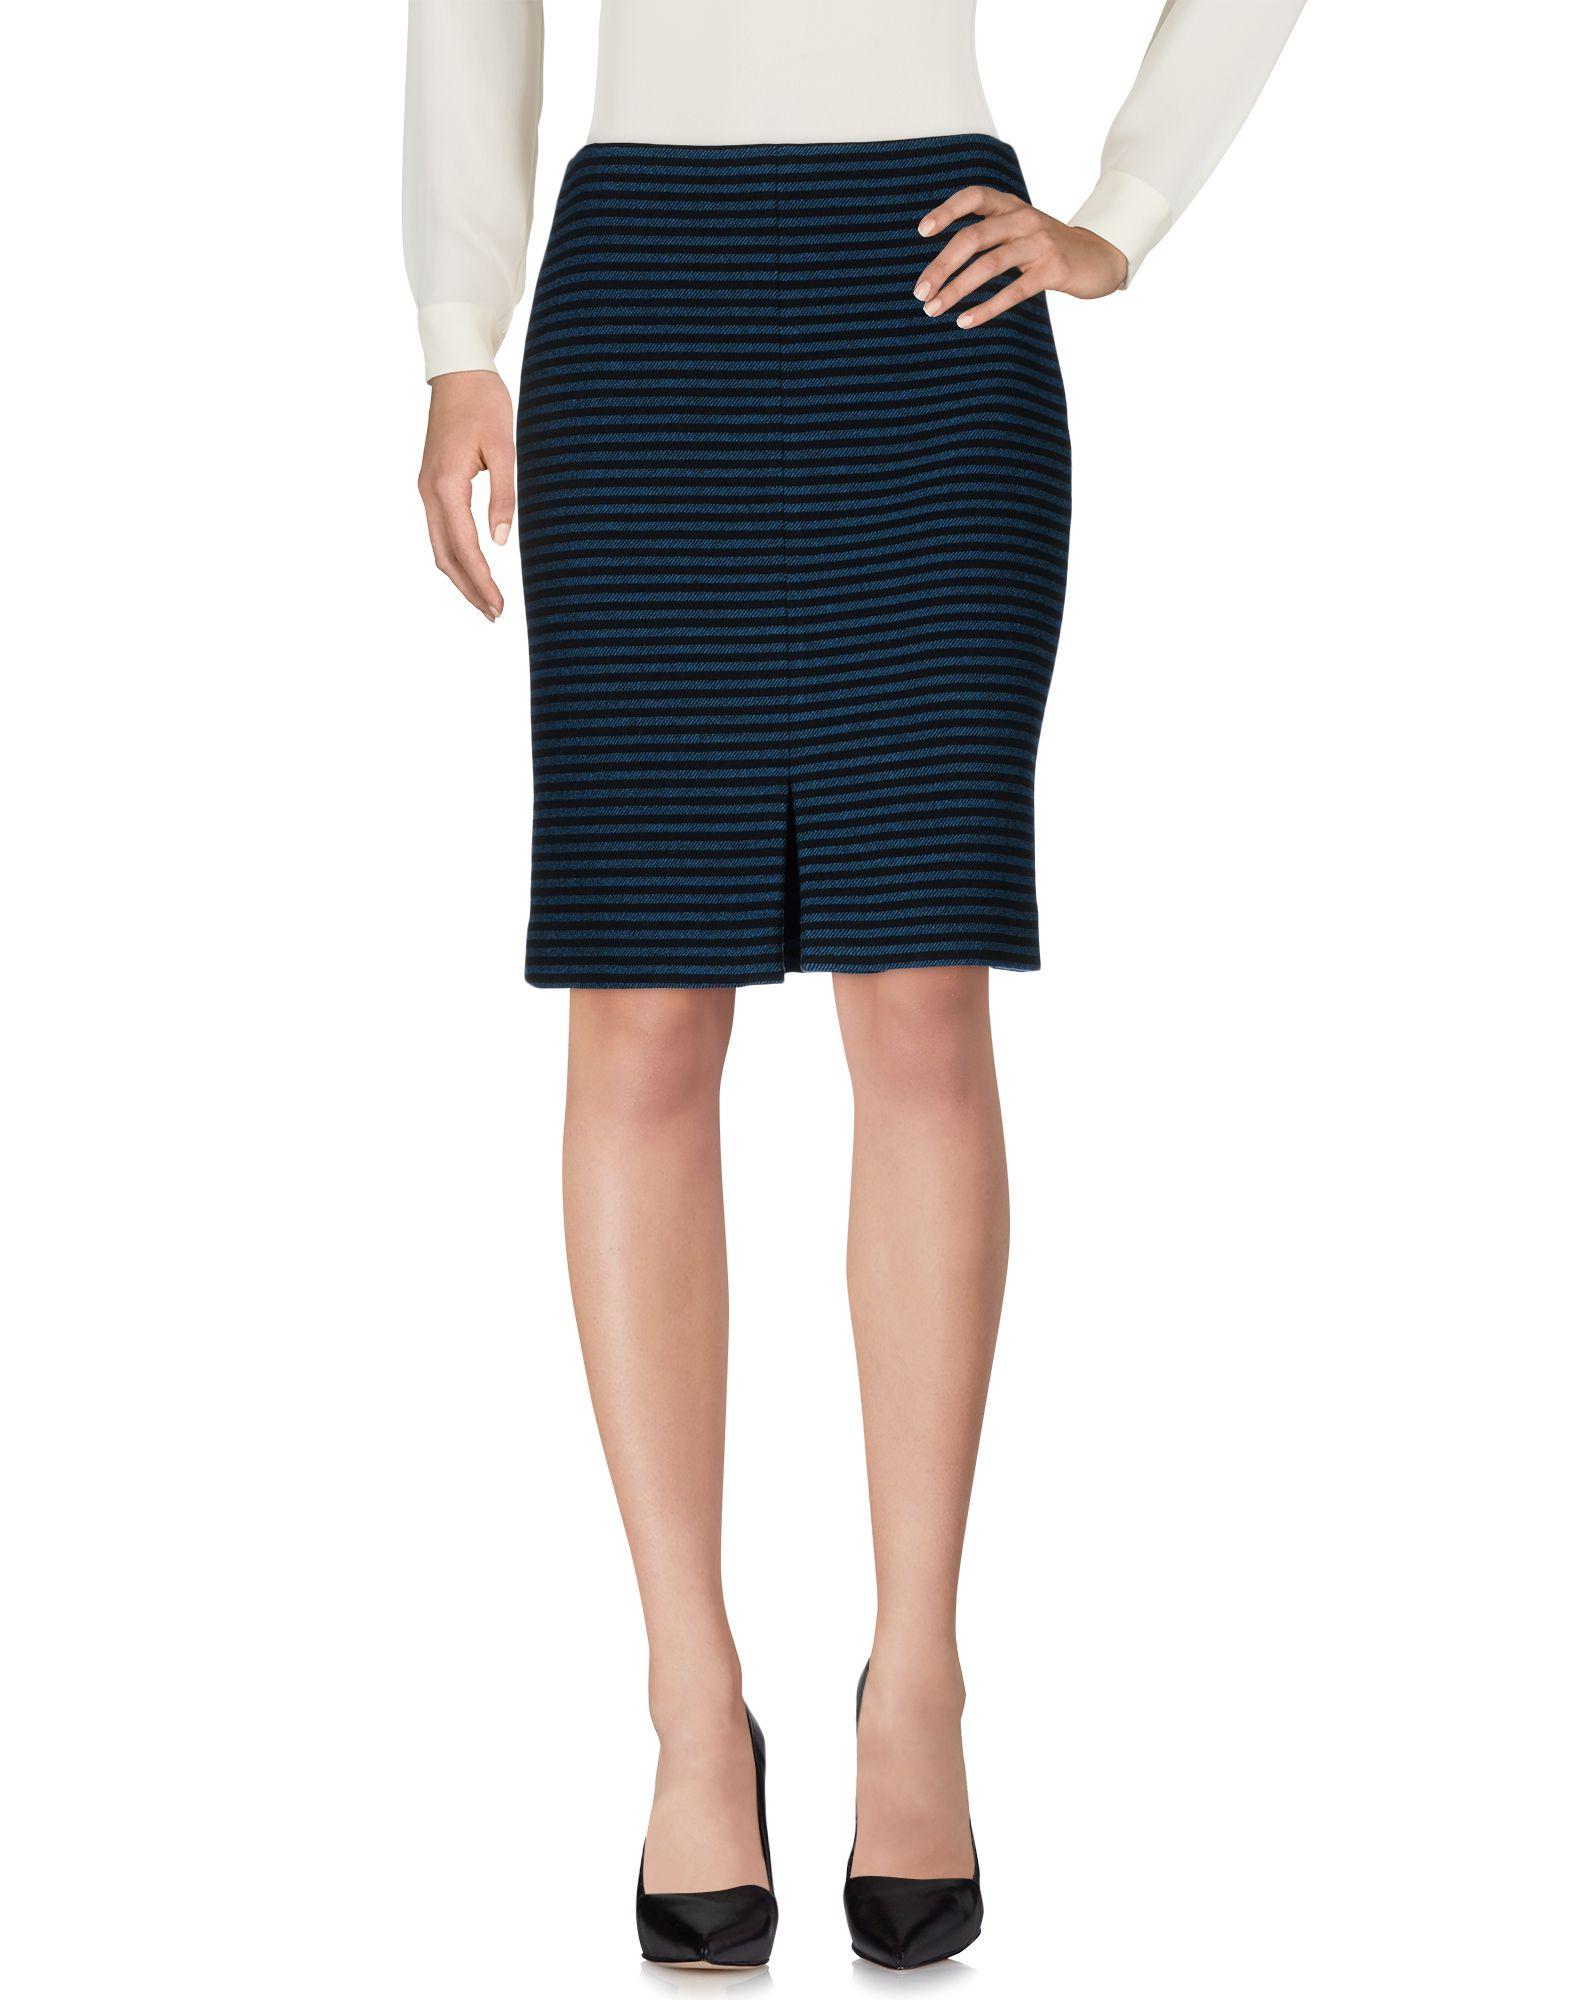 Shoppable Search Camila Stripes Skirt Leux Studio Navy L 35323135us 14 F